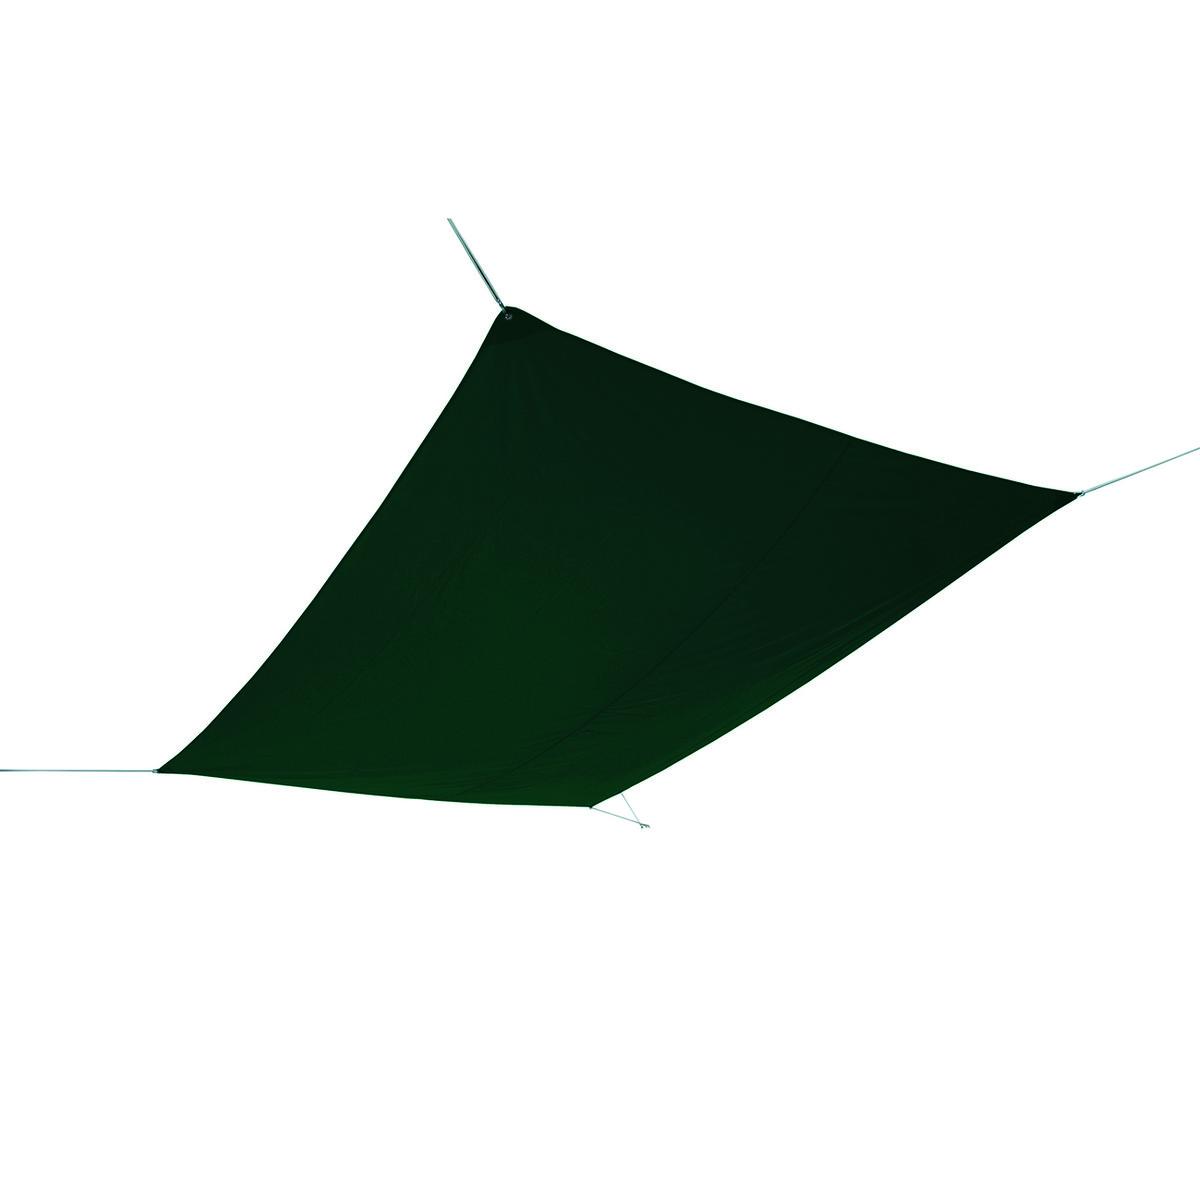 Rotex telo vela ombreggiante parasole prezzo e offerte for Telo ombreggiante leroy merlin